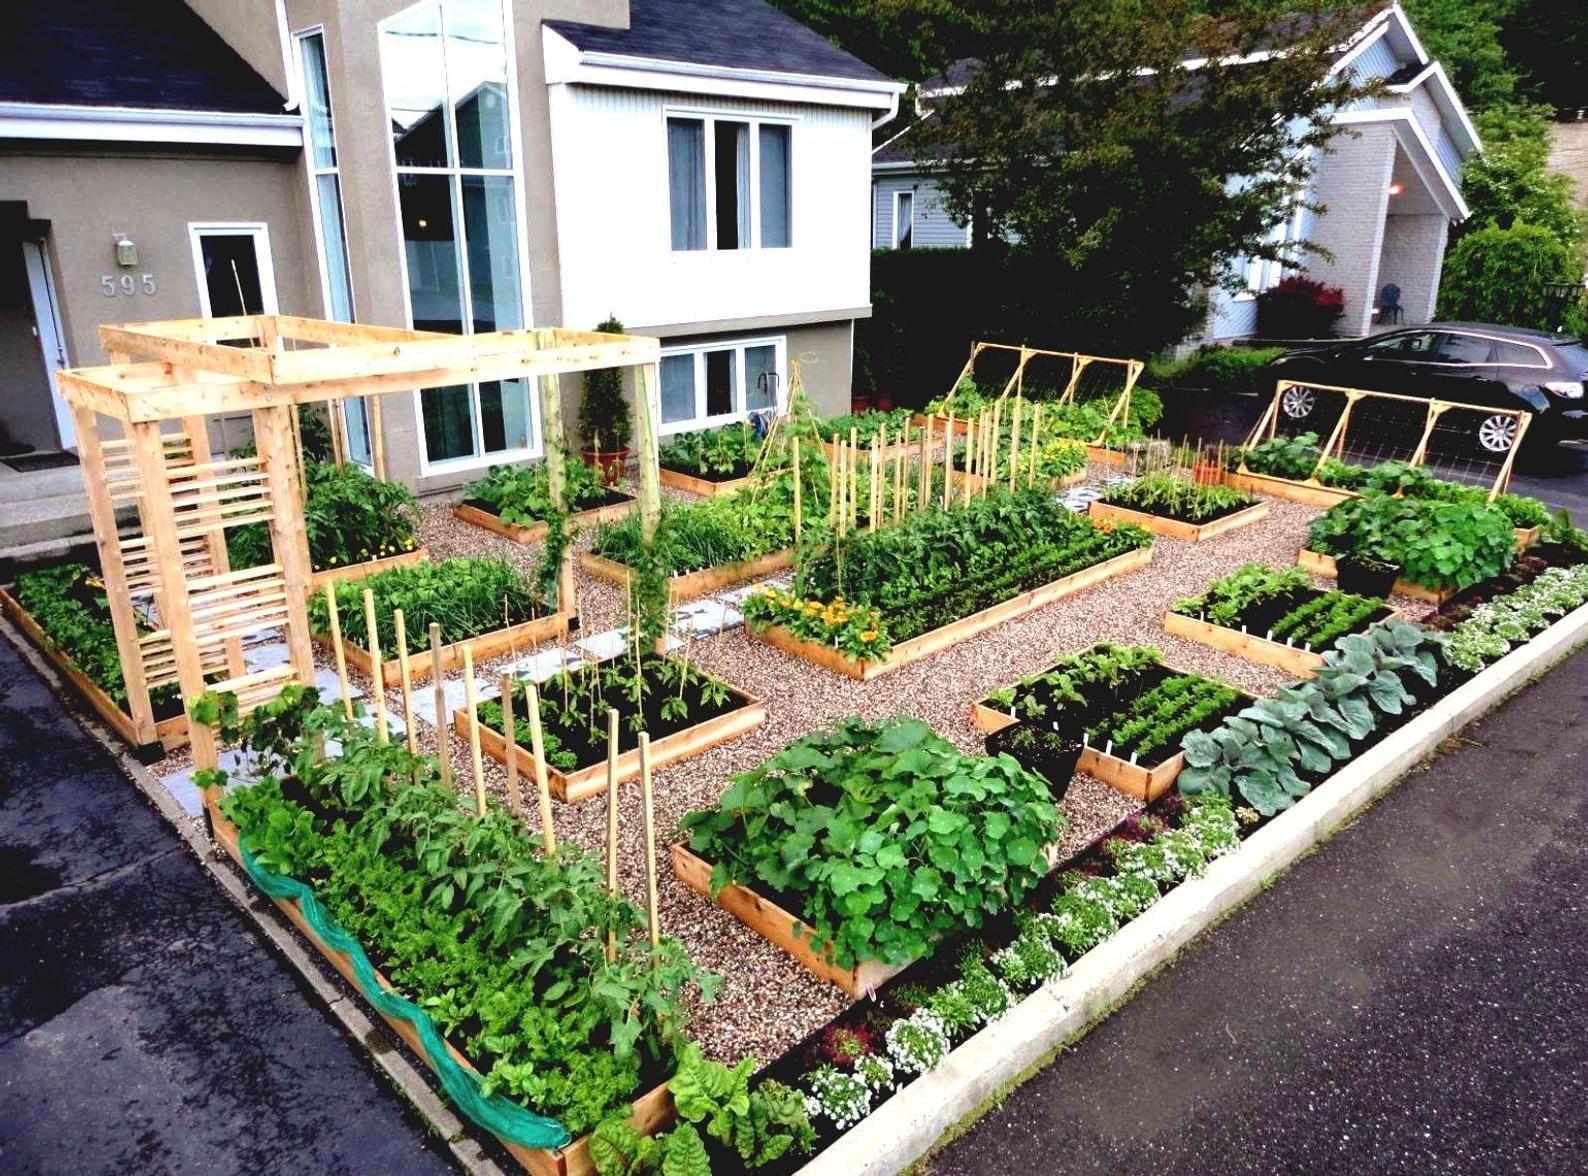 Large Garden Survival Garden Emergency Food Seeds 50 Kinds Heirloom Usa Seeds In 2020 Garden Bed Layout Garden Layout Garden Design Layout